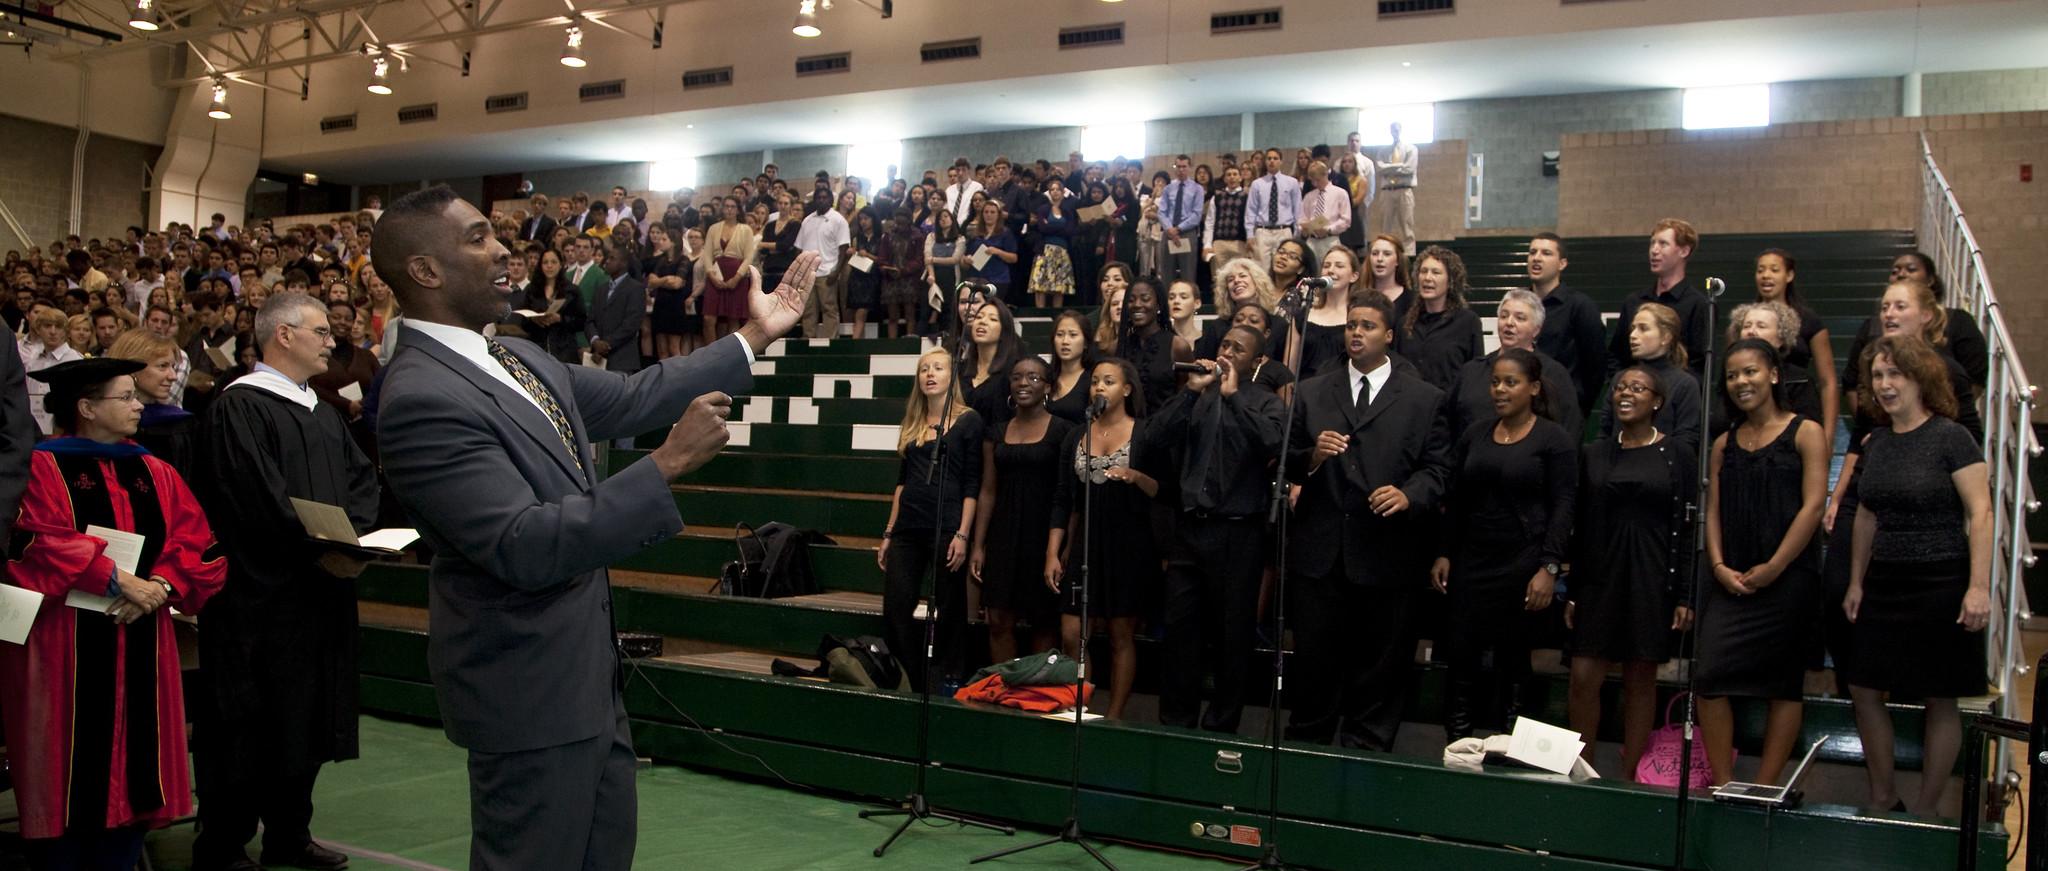 The Dartmouth Gospel Choir, under the direction of Walt Cunningham